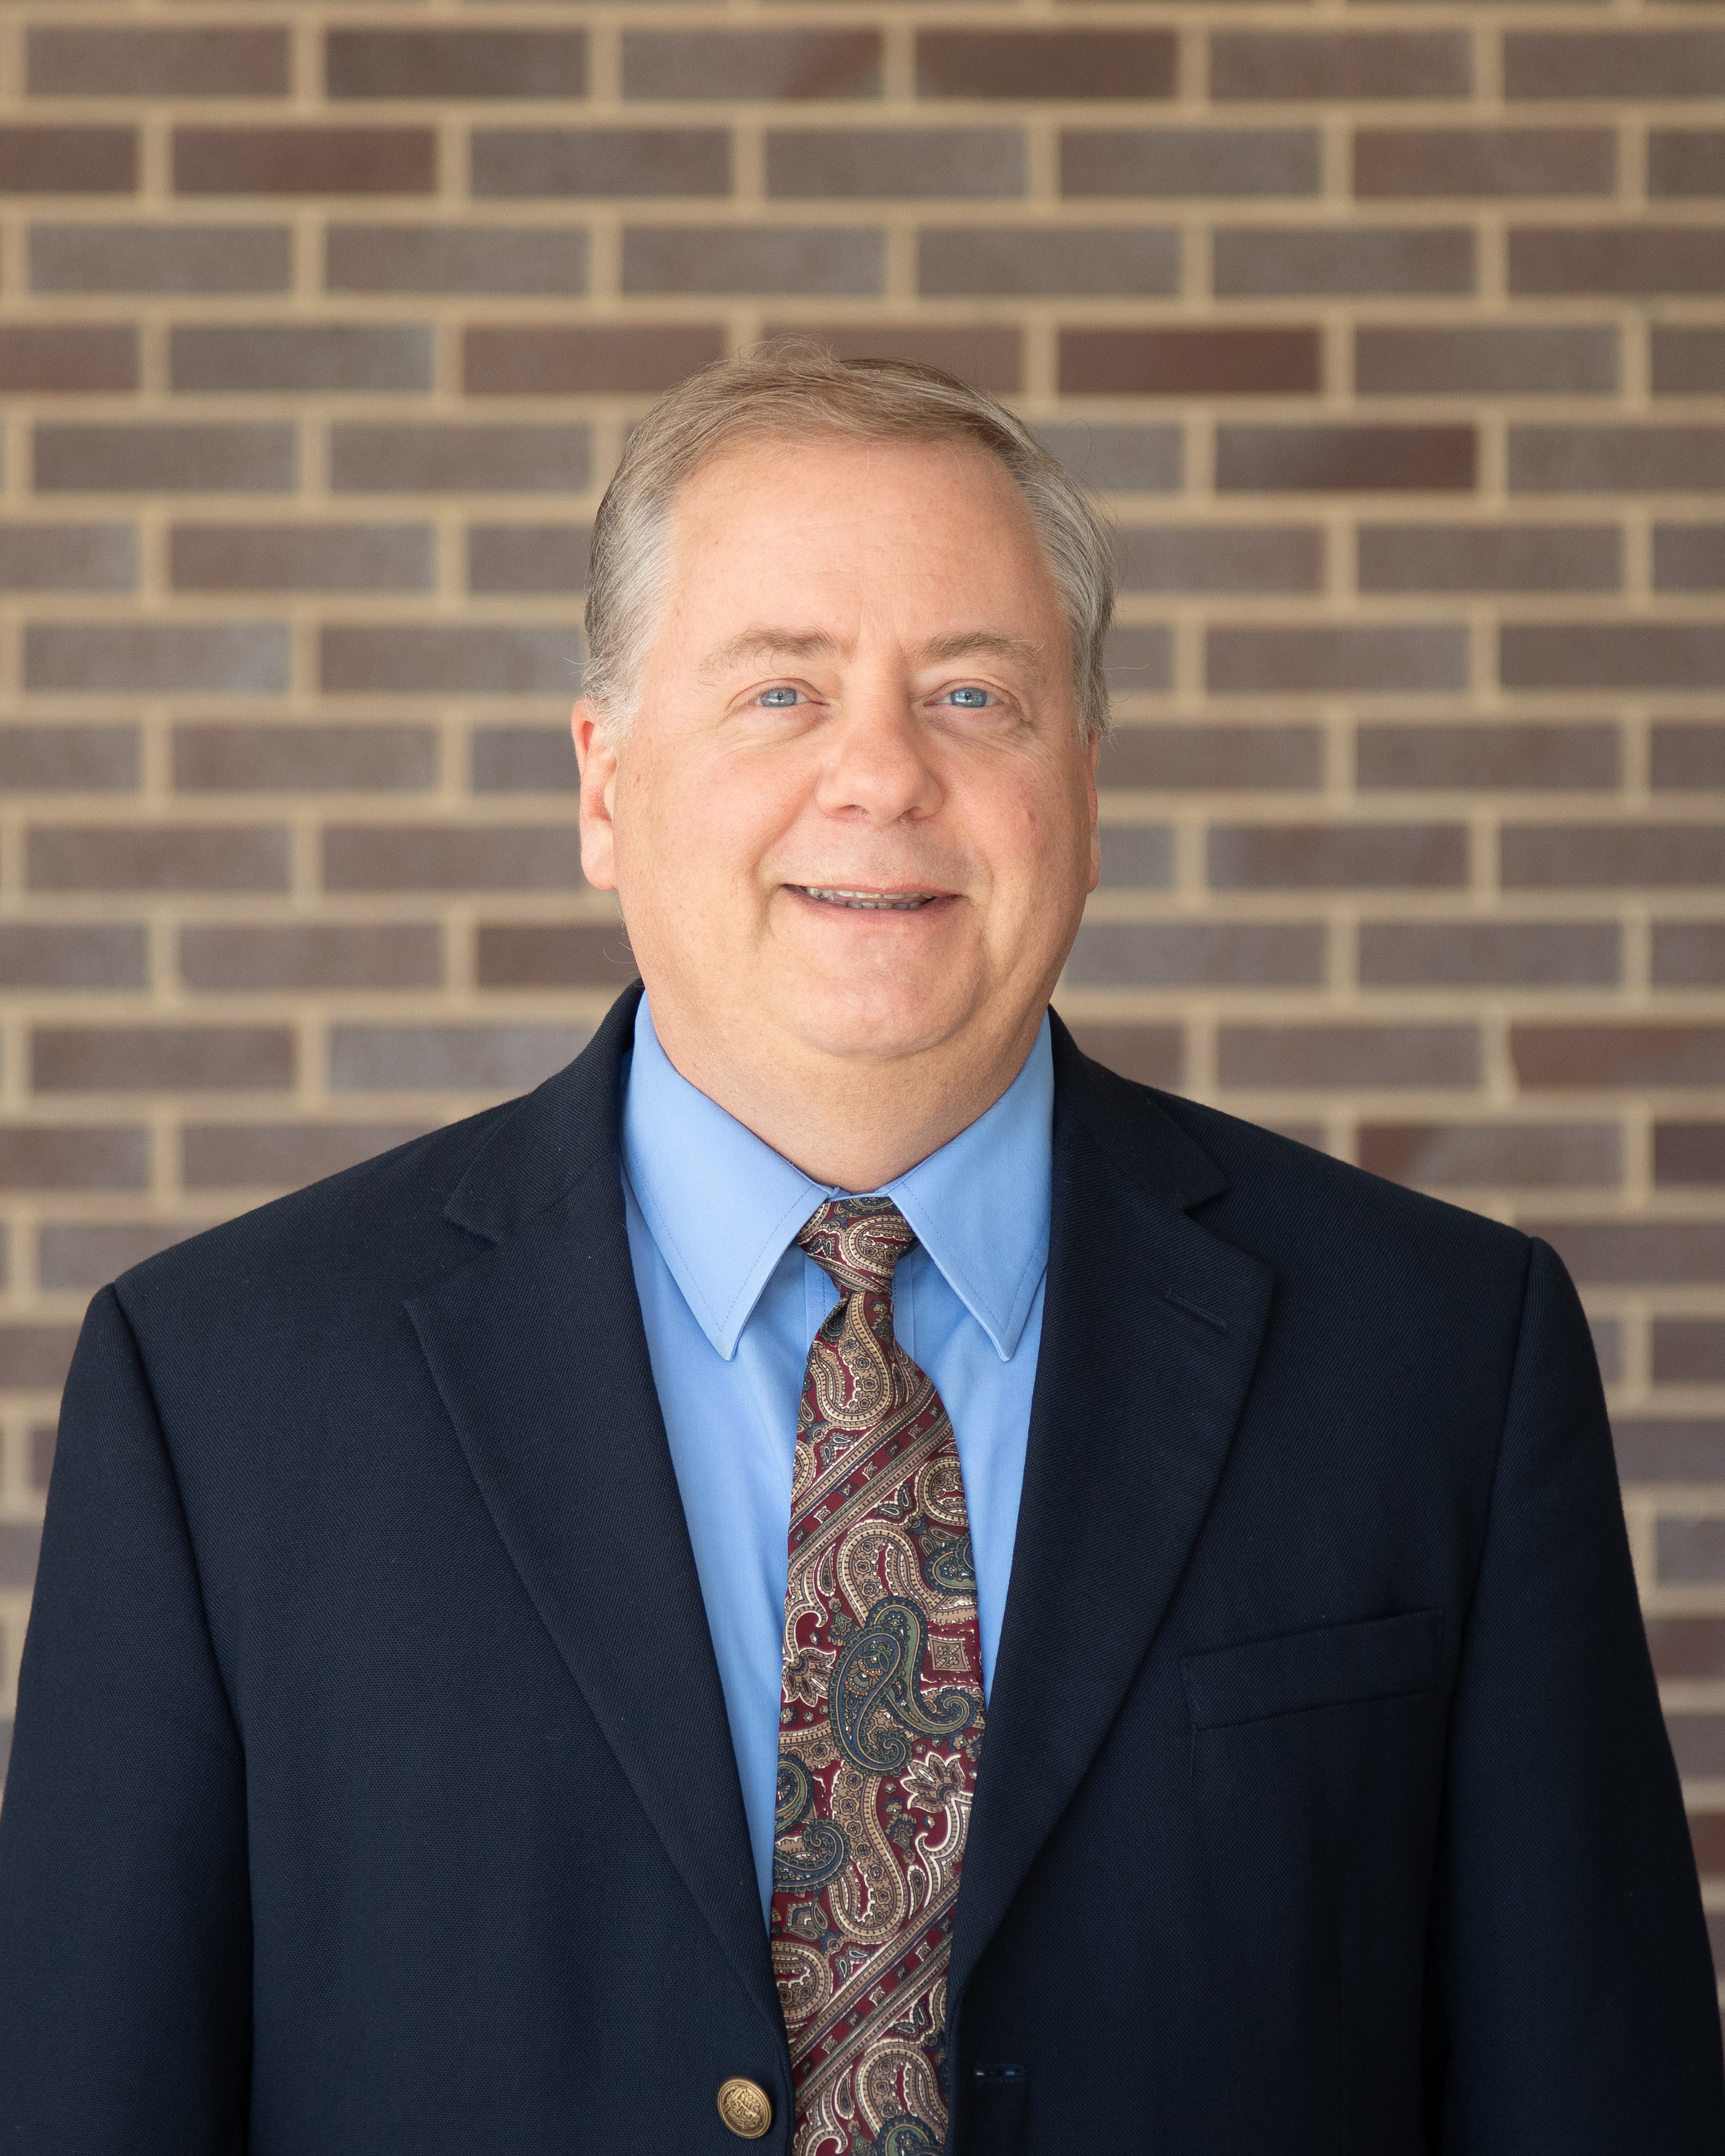 Jerry Westenkuehler, DMADirector of Instrumental Music & Organist - Email: Jerry@ArborlawnUMC.org